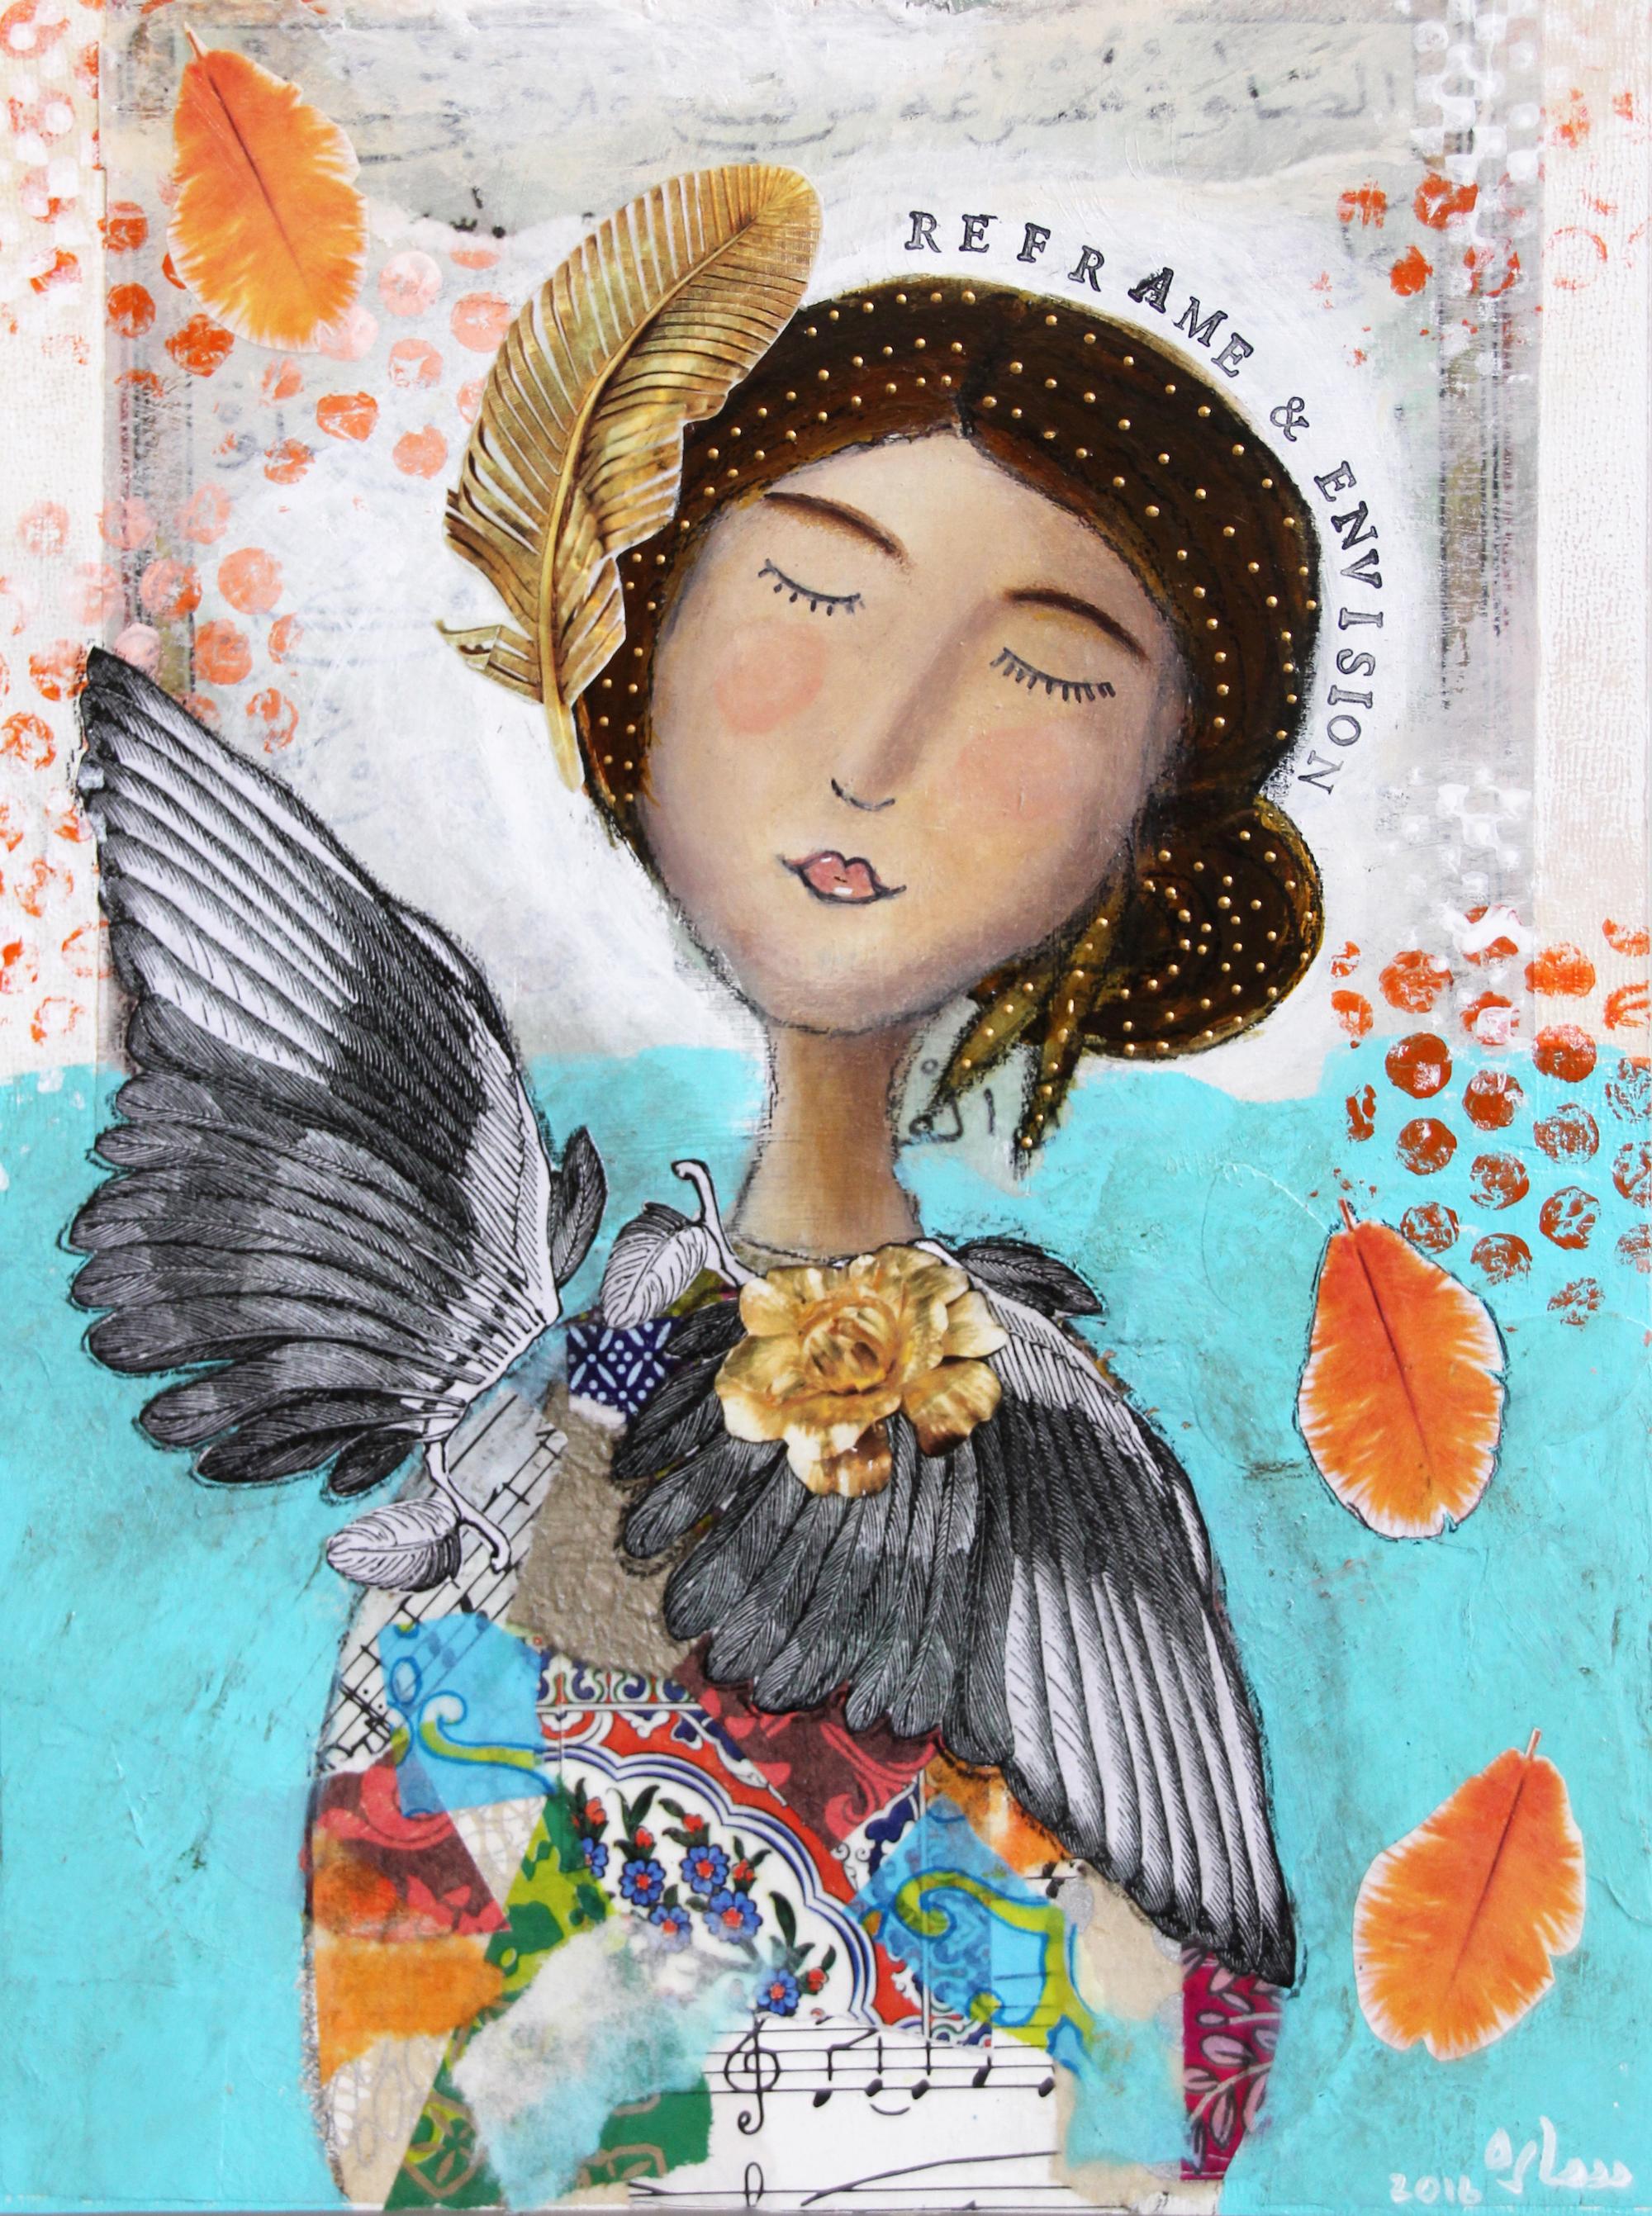 Angel of Reframing